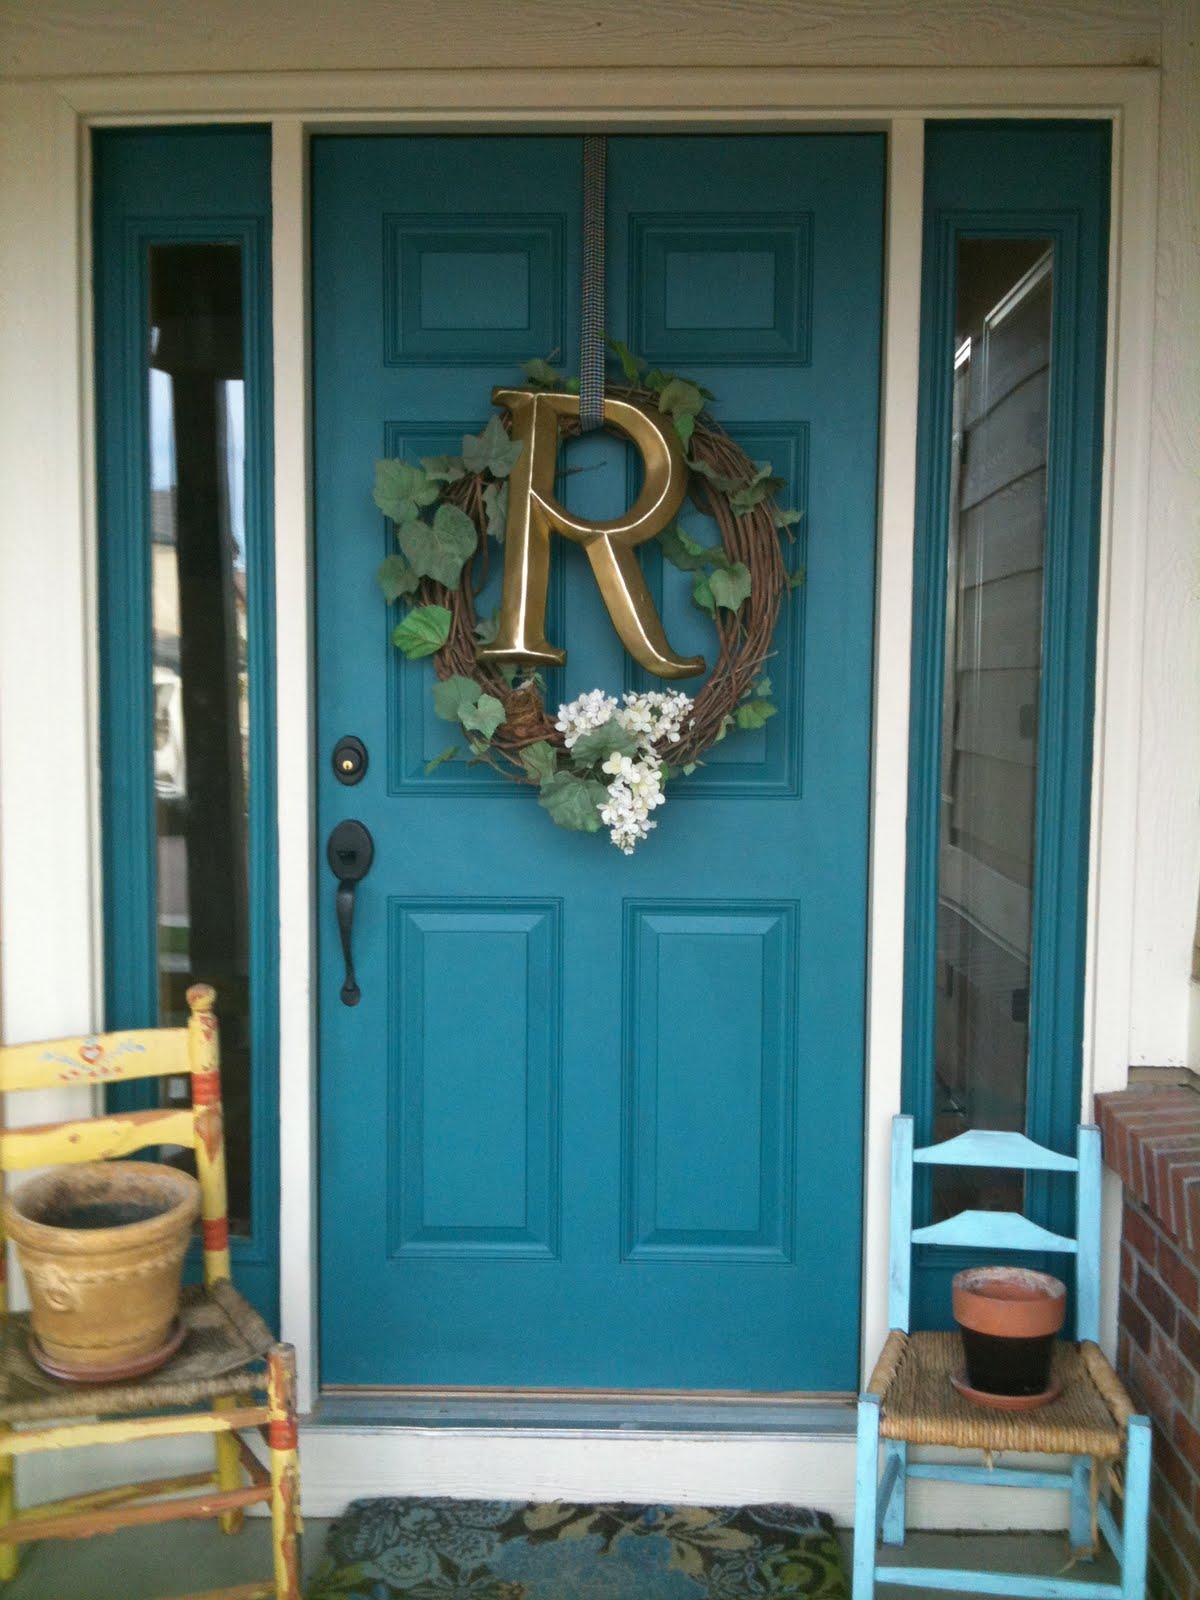 Husker dream homes express yourself for Teal front door